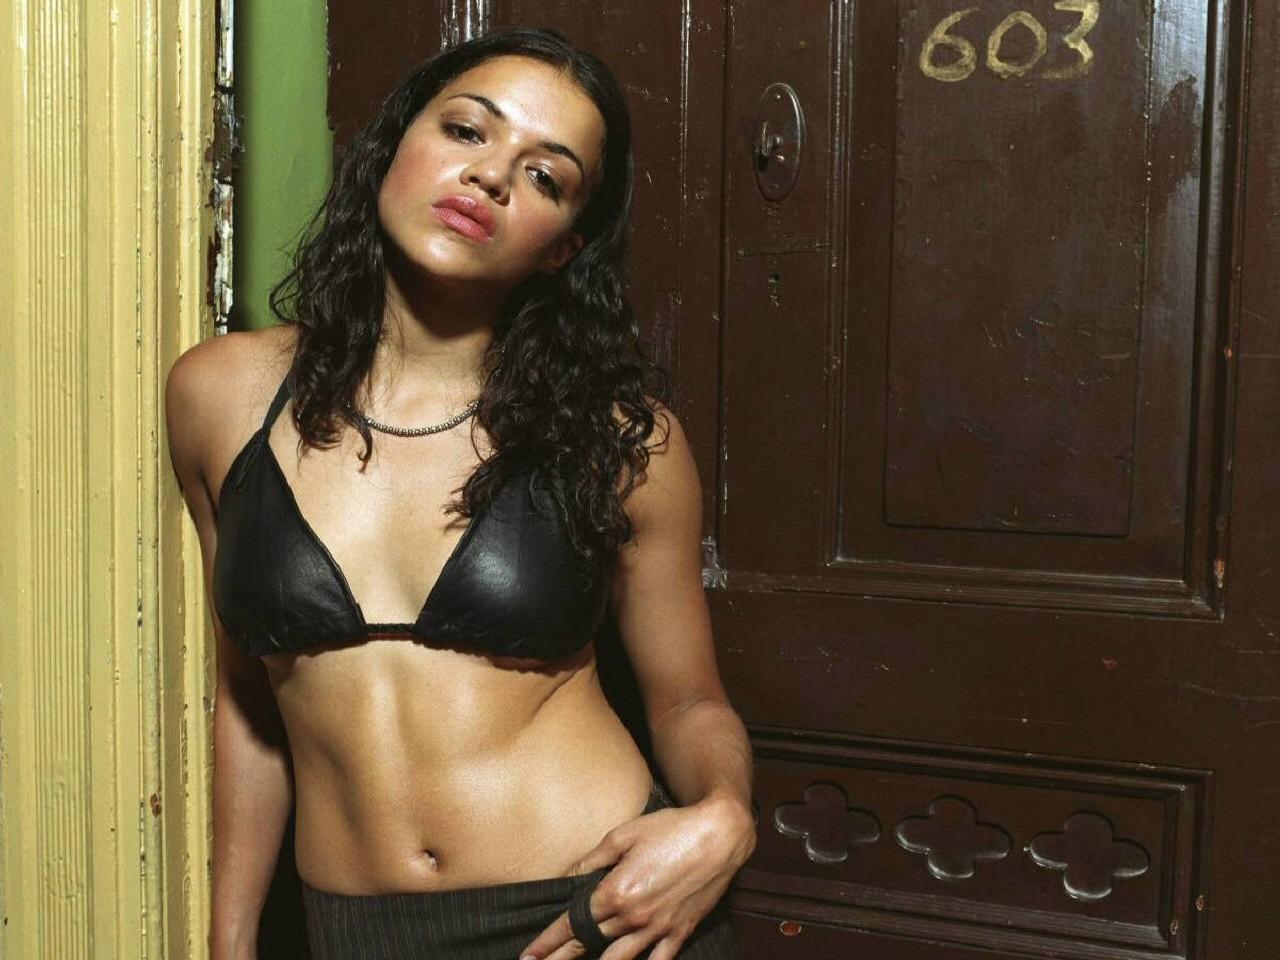 Wallpaper di Michelle Rodriguez in lingerie